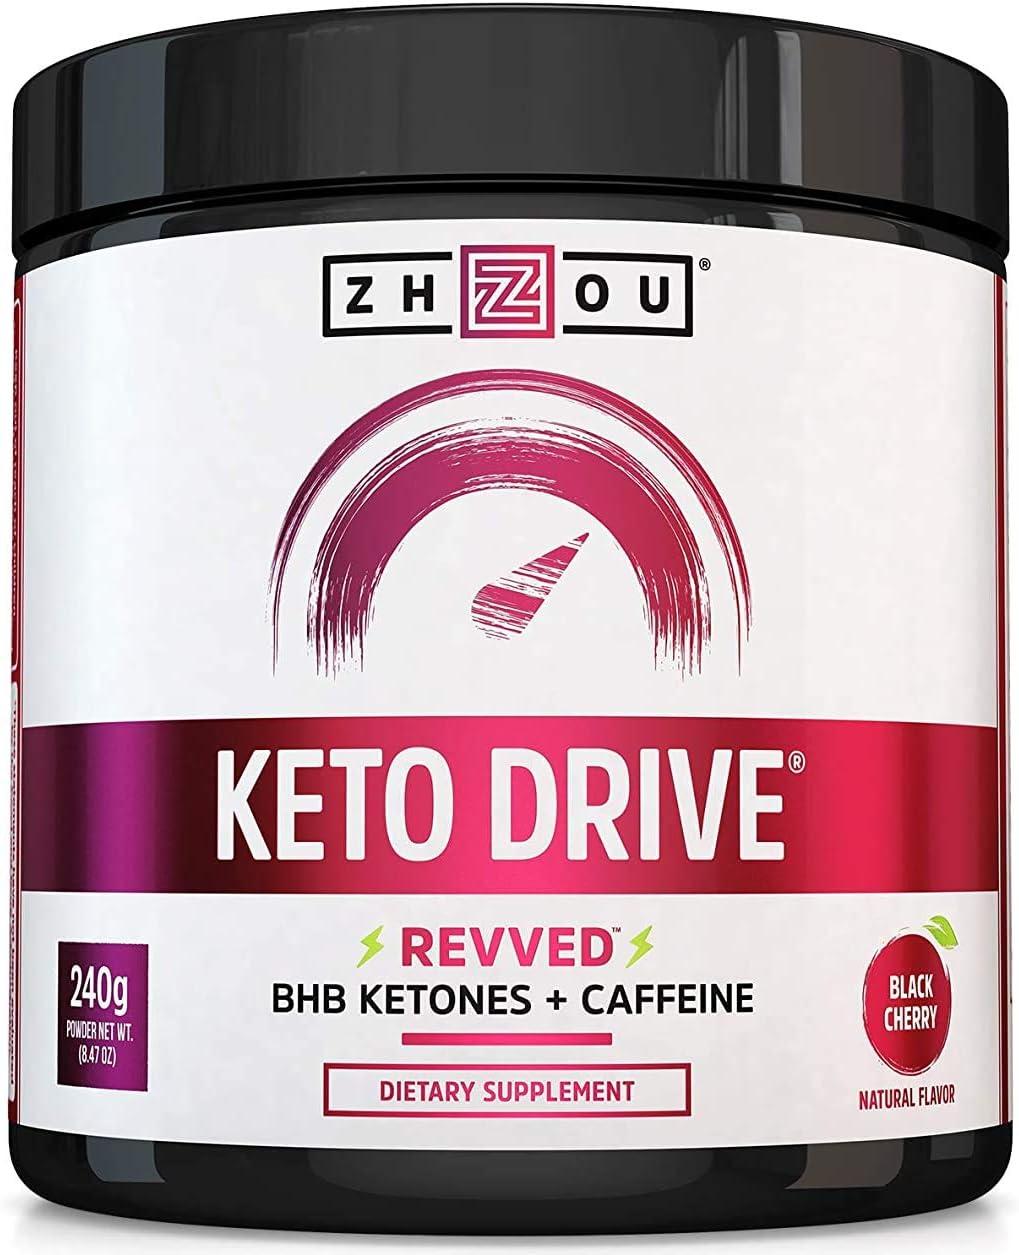 KETO DRIVE with BHB Ketones + Caffeine, Patented Beta-Hydroxybutyrates & Electrolytes (Calcium, Sodium, Magnesium) - Black Cherry 'REVVED', 8.4 oz: Health & Personal Care